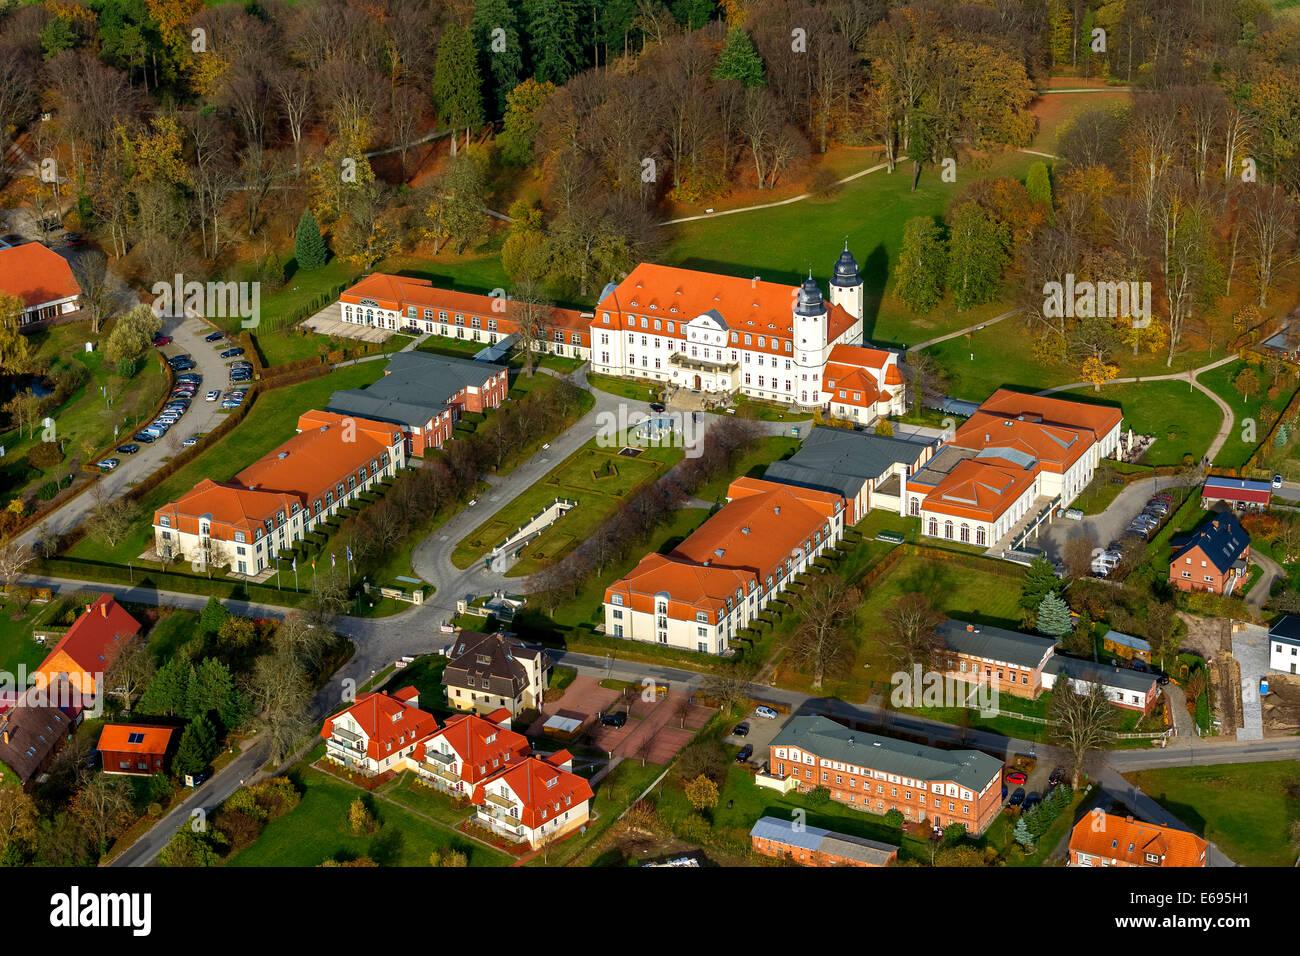 Aerial view, Radisson Blu Resort Schloss Fleesensee, Scandinavian Golf Club in Göhren-Lebbin, Mecklenburg-Western - Stock Image